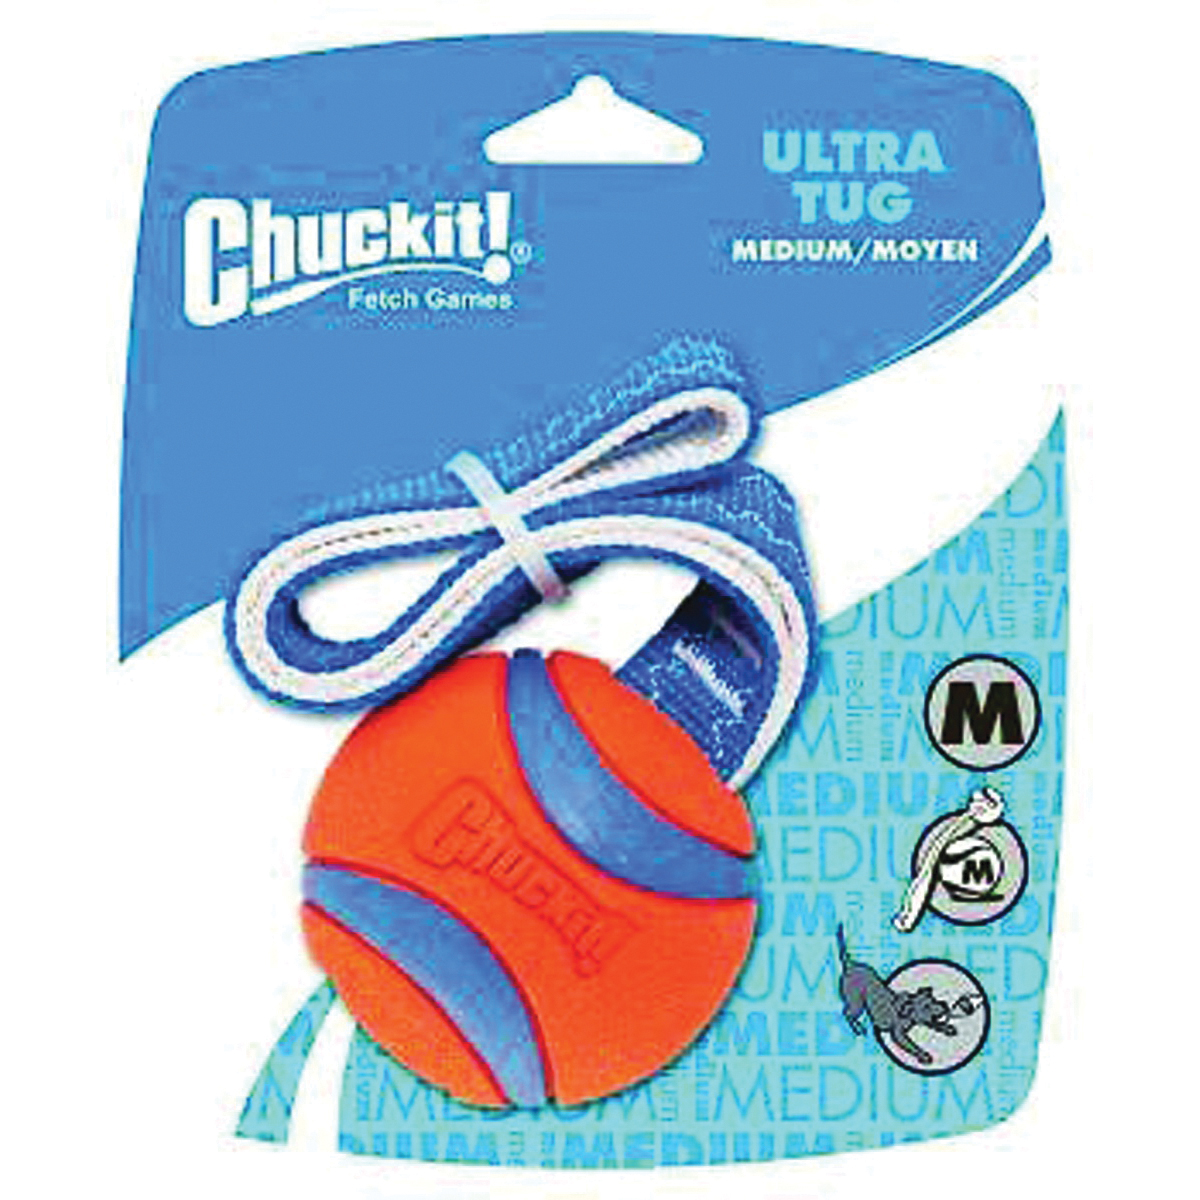 Picture of Chuckit! 231201 Ultra Tug Dog Toy, M, Nylon/Rubber, Blue/Orange